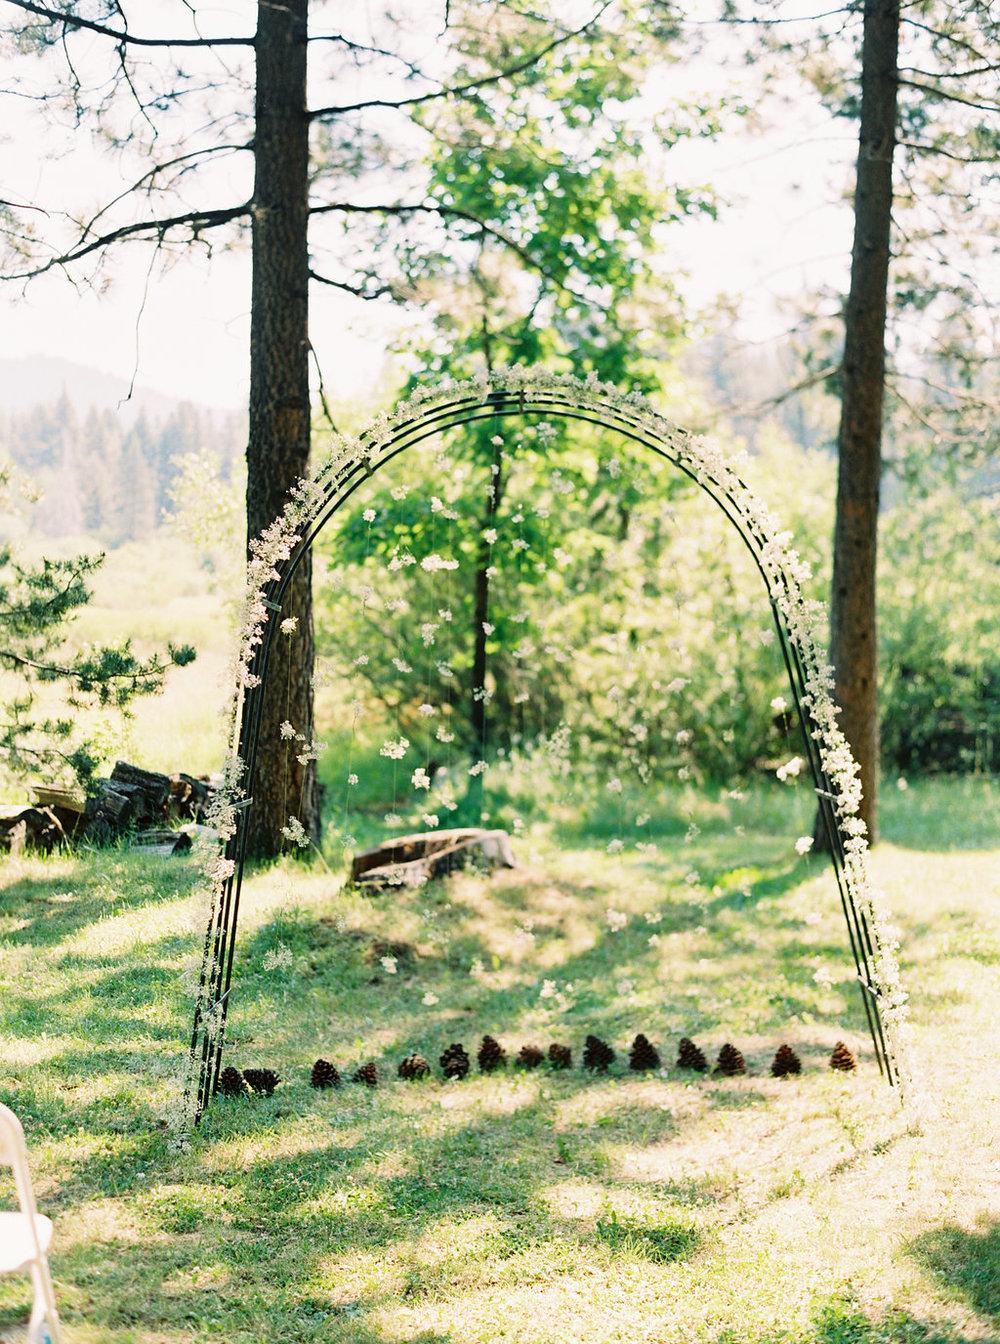 000015_gallardo_wedding_film0015.jpg